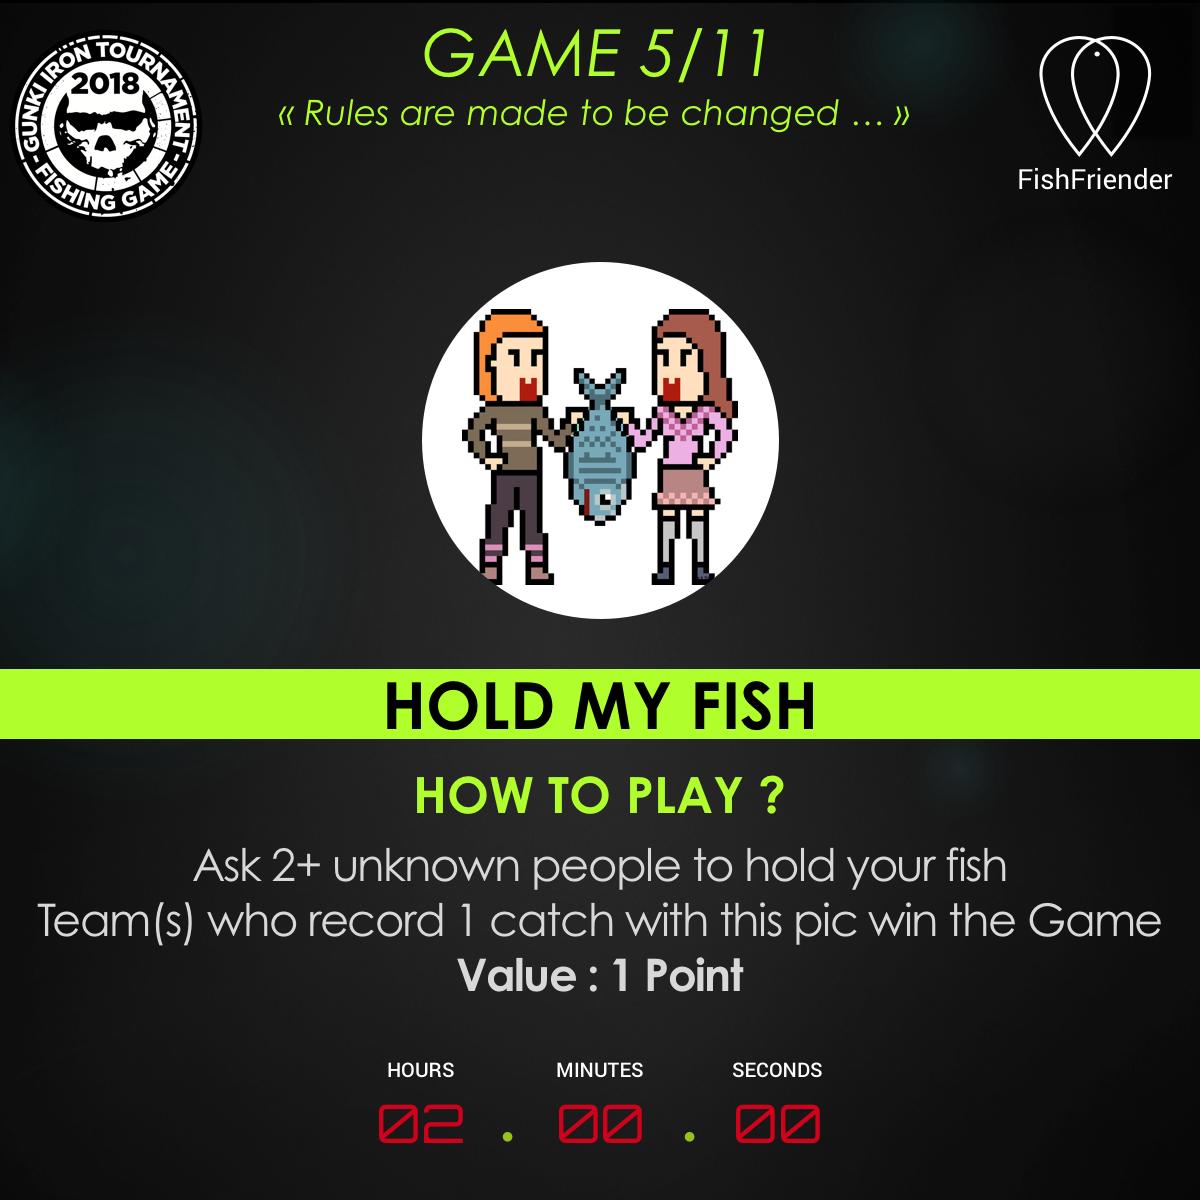 Hold My Fish